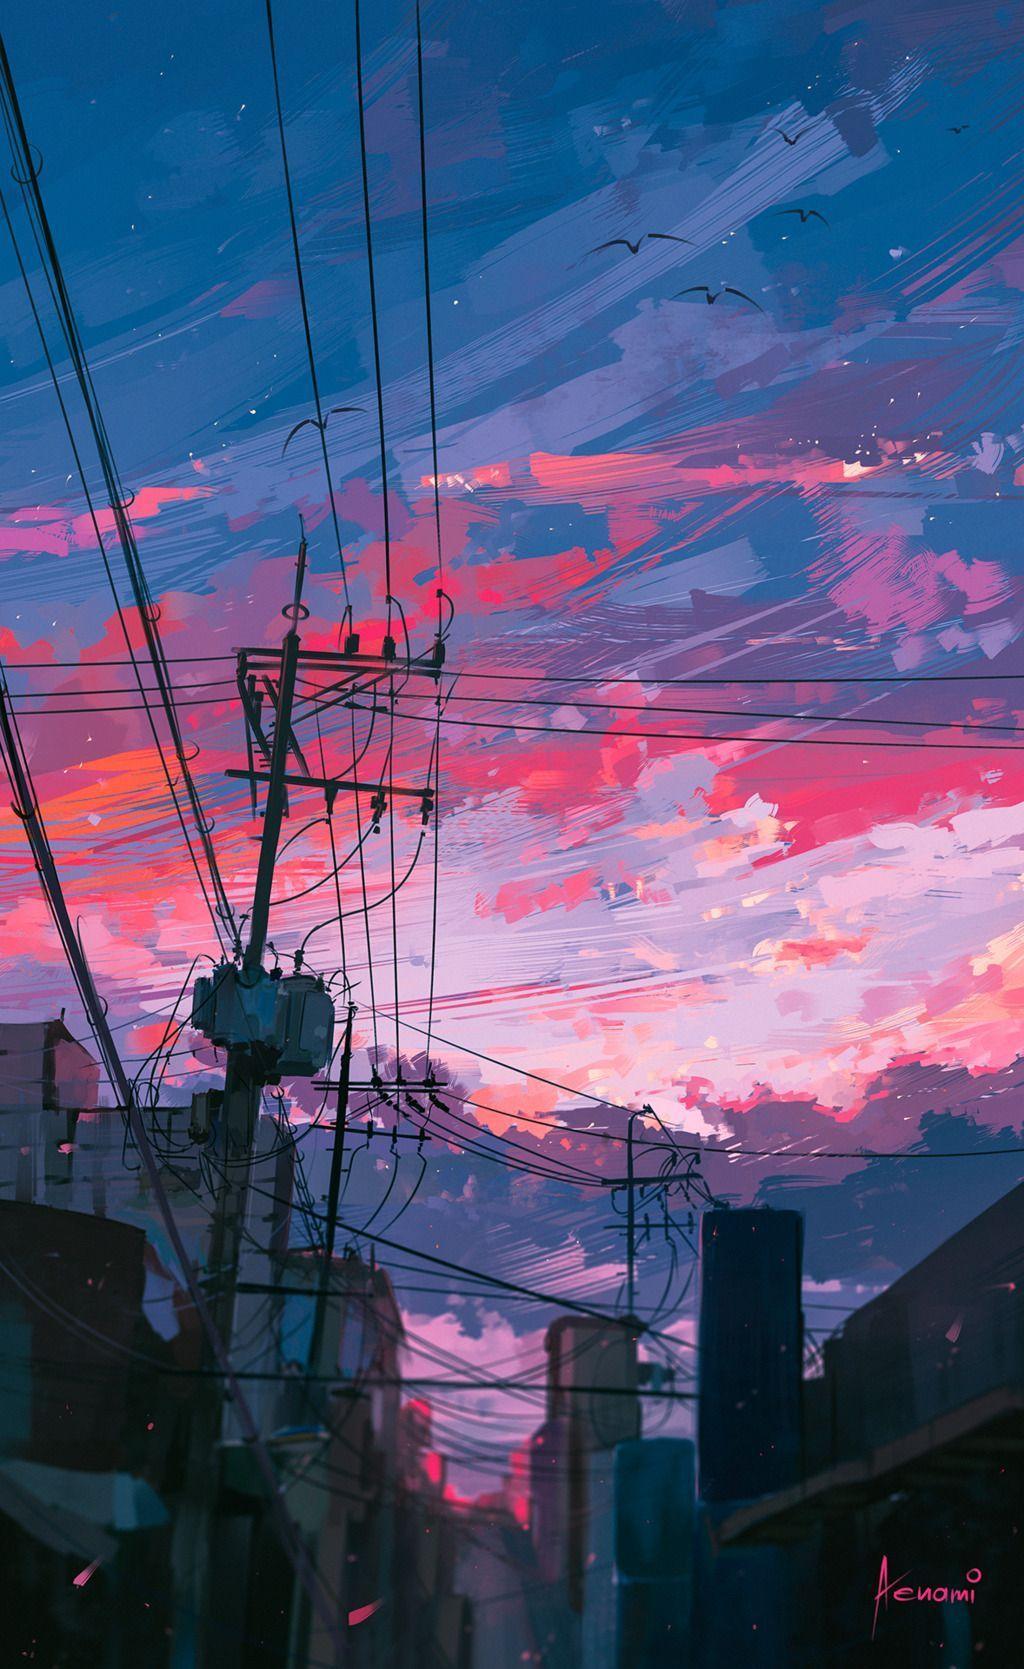 Aesthetic Anime Wallpaper : aesthetic, anime, wallpaper, Aesthetic, Anime, Wallpaper